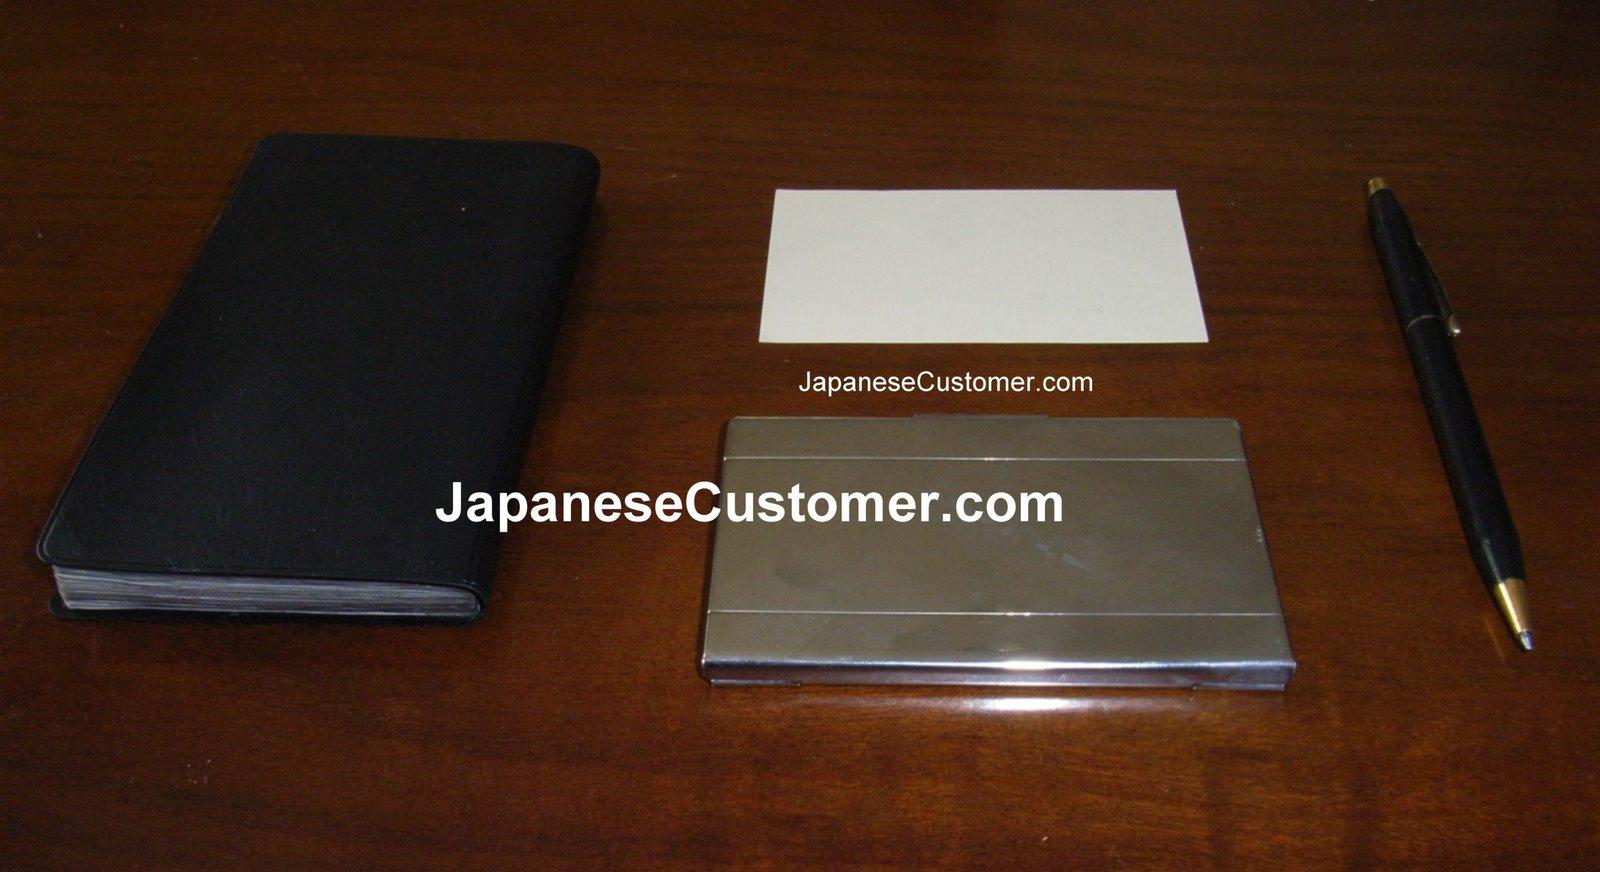 Doing business in Japan Copyright Peter Hanami 2010